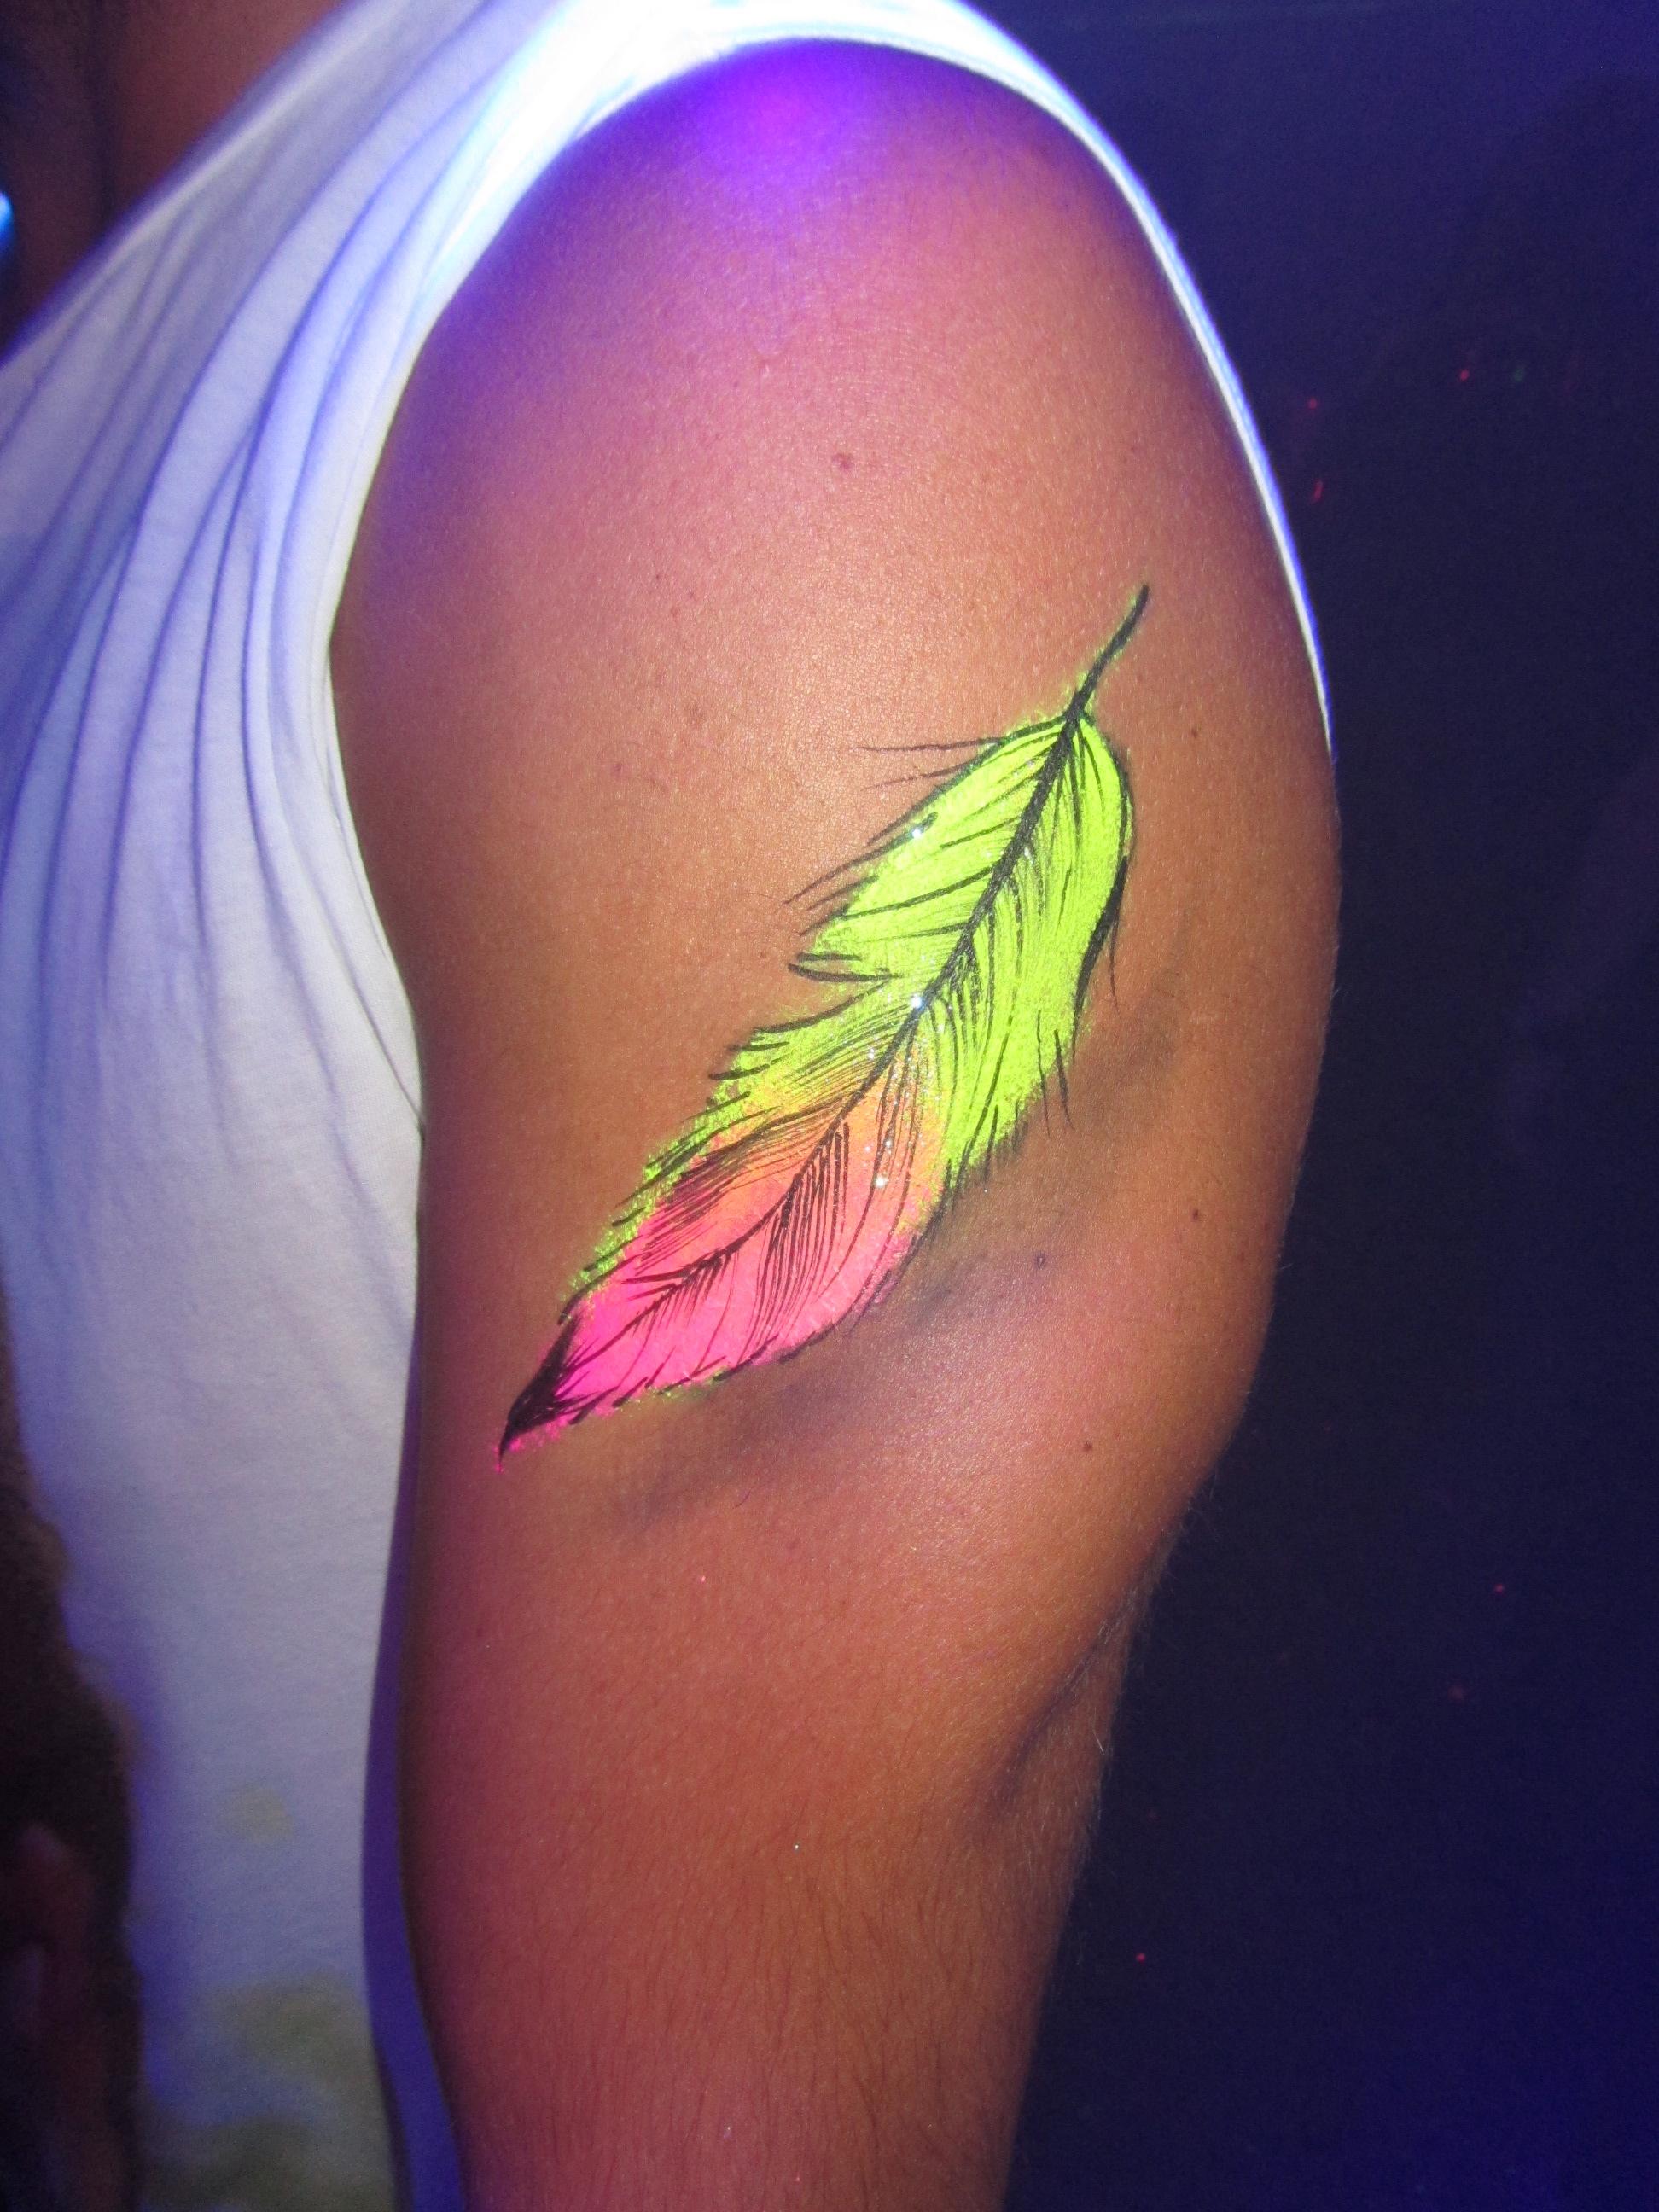 feather arm_d a y.jpg